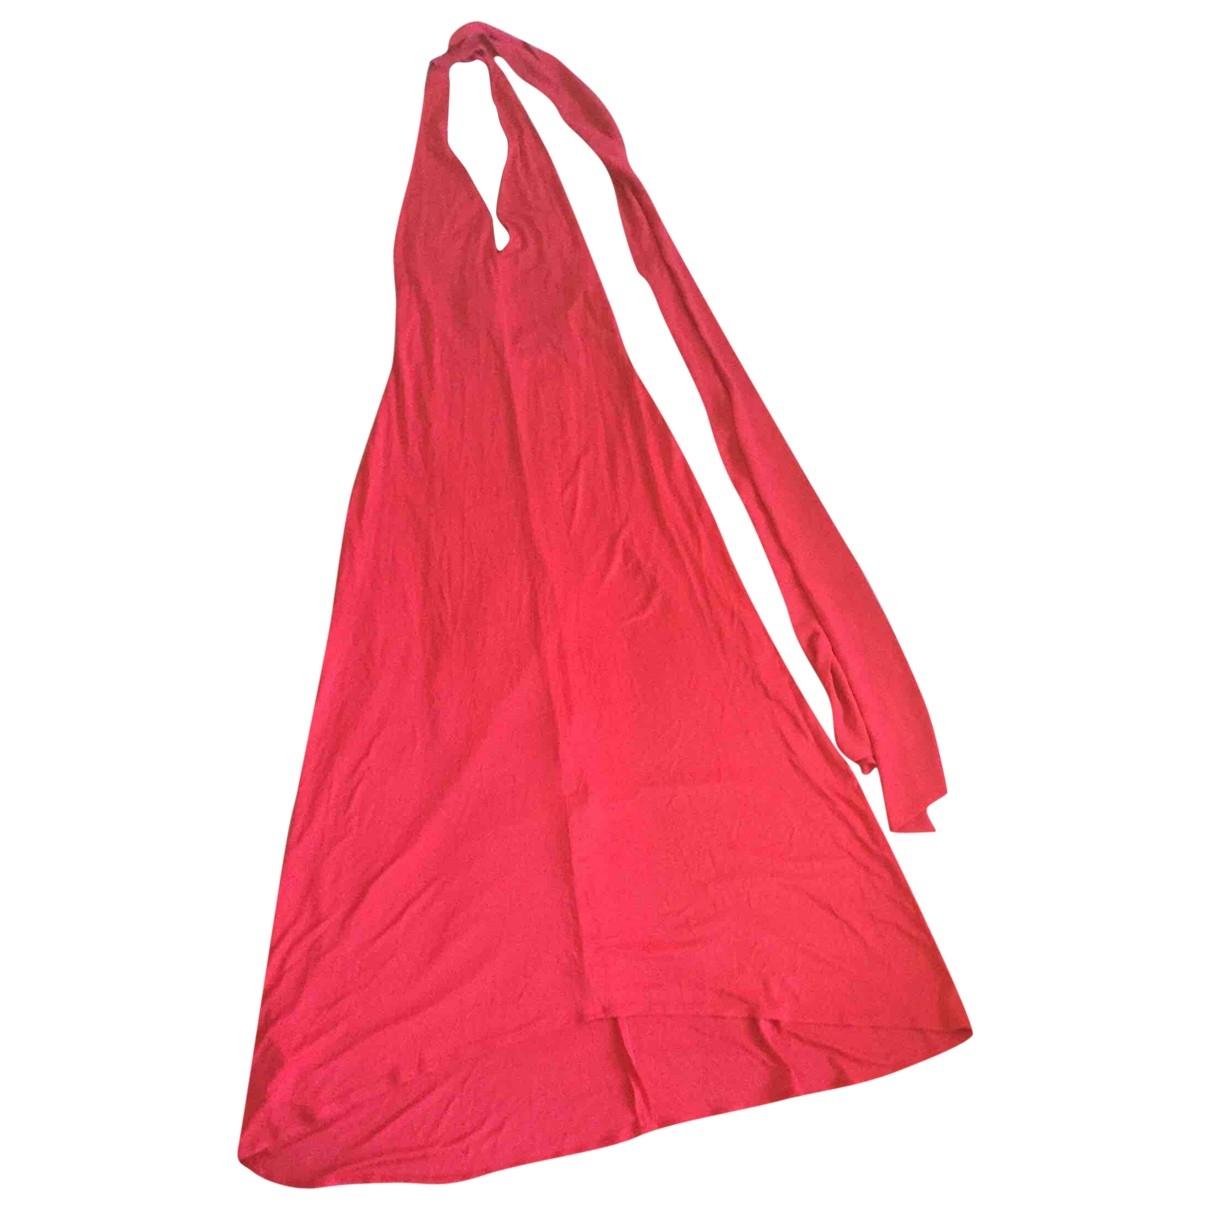 Bcbg Max Azria \N Red dress for Women XS International